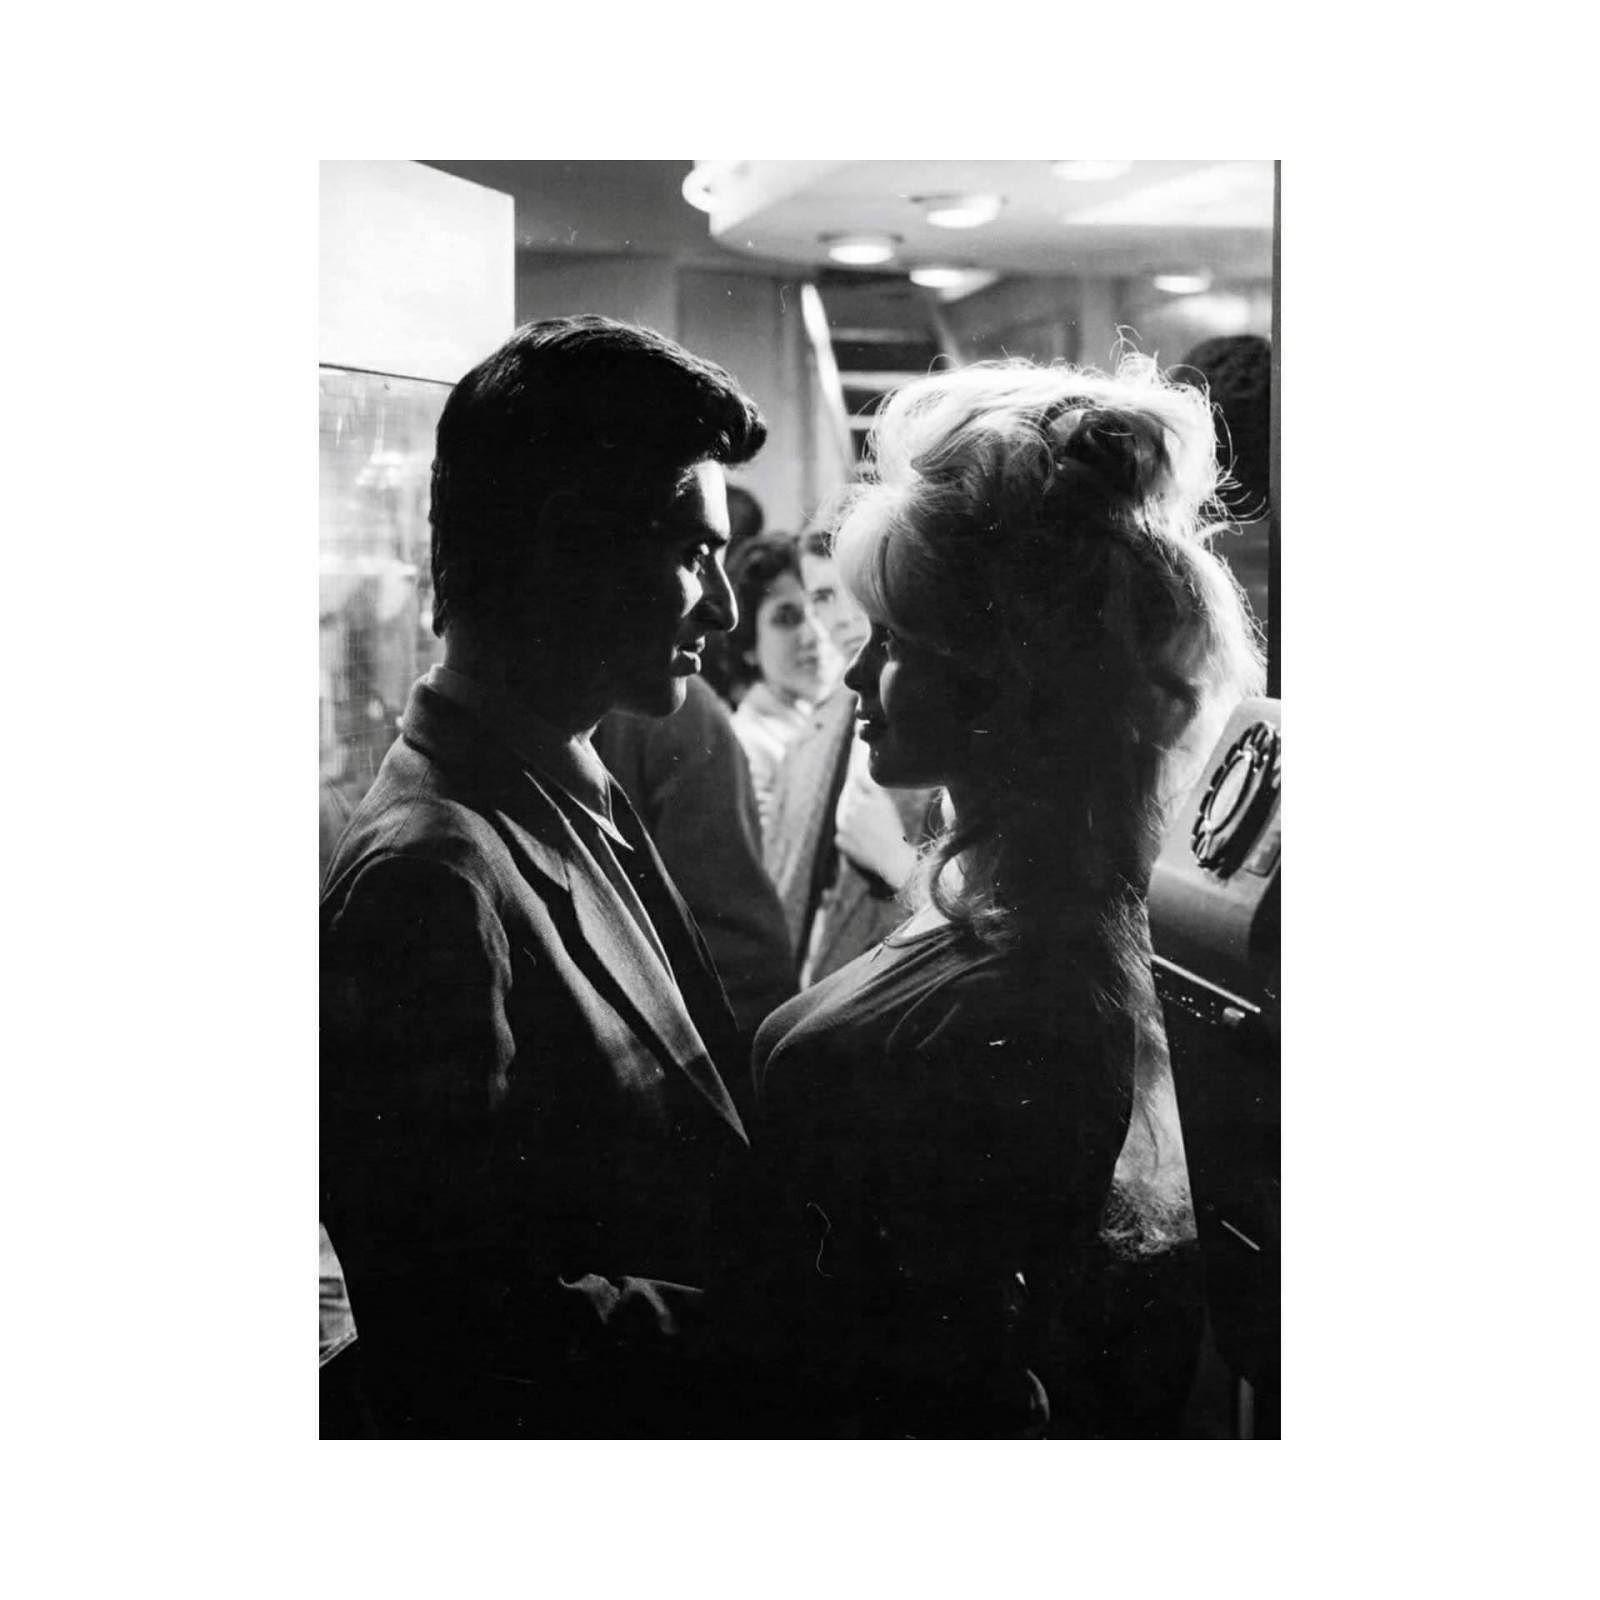 Sami Frey and Brigitte Bardot in La vérité directed by Henri-George Clouzot 1960.  #samifrey #brigittebardot #60s #movie #french #couple #love #bw #mcm #weekend #film #chic #menswear #icon #inspiration #instamood #mood